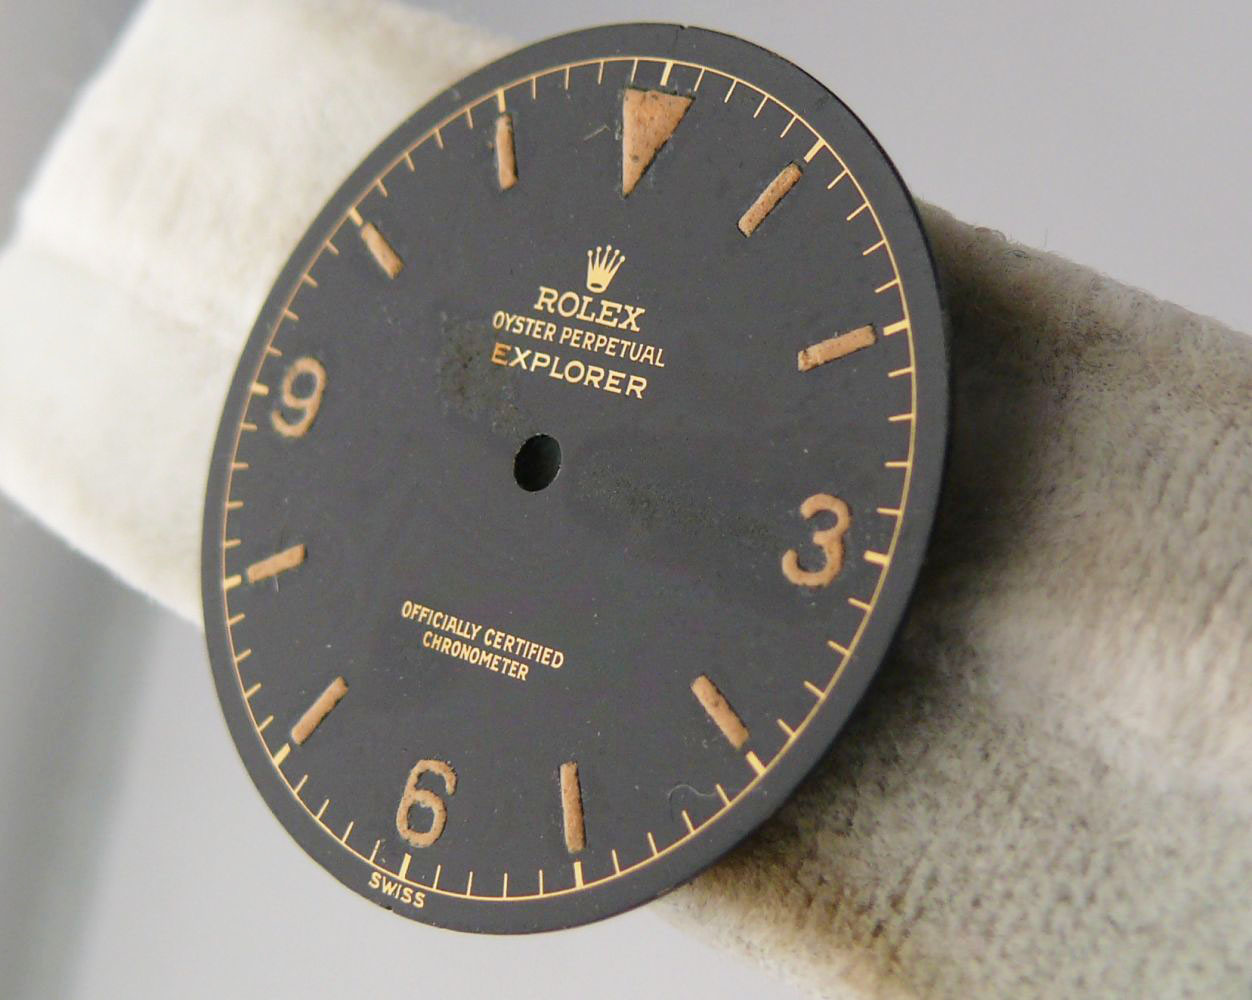 1950s Rolex Gents Explorer Dial Ref 6610, genuine 1950s rolex explorer dial showing some radium burn - Image 5 of 8